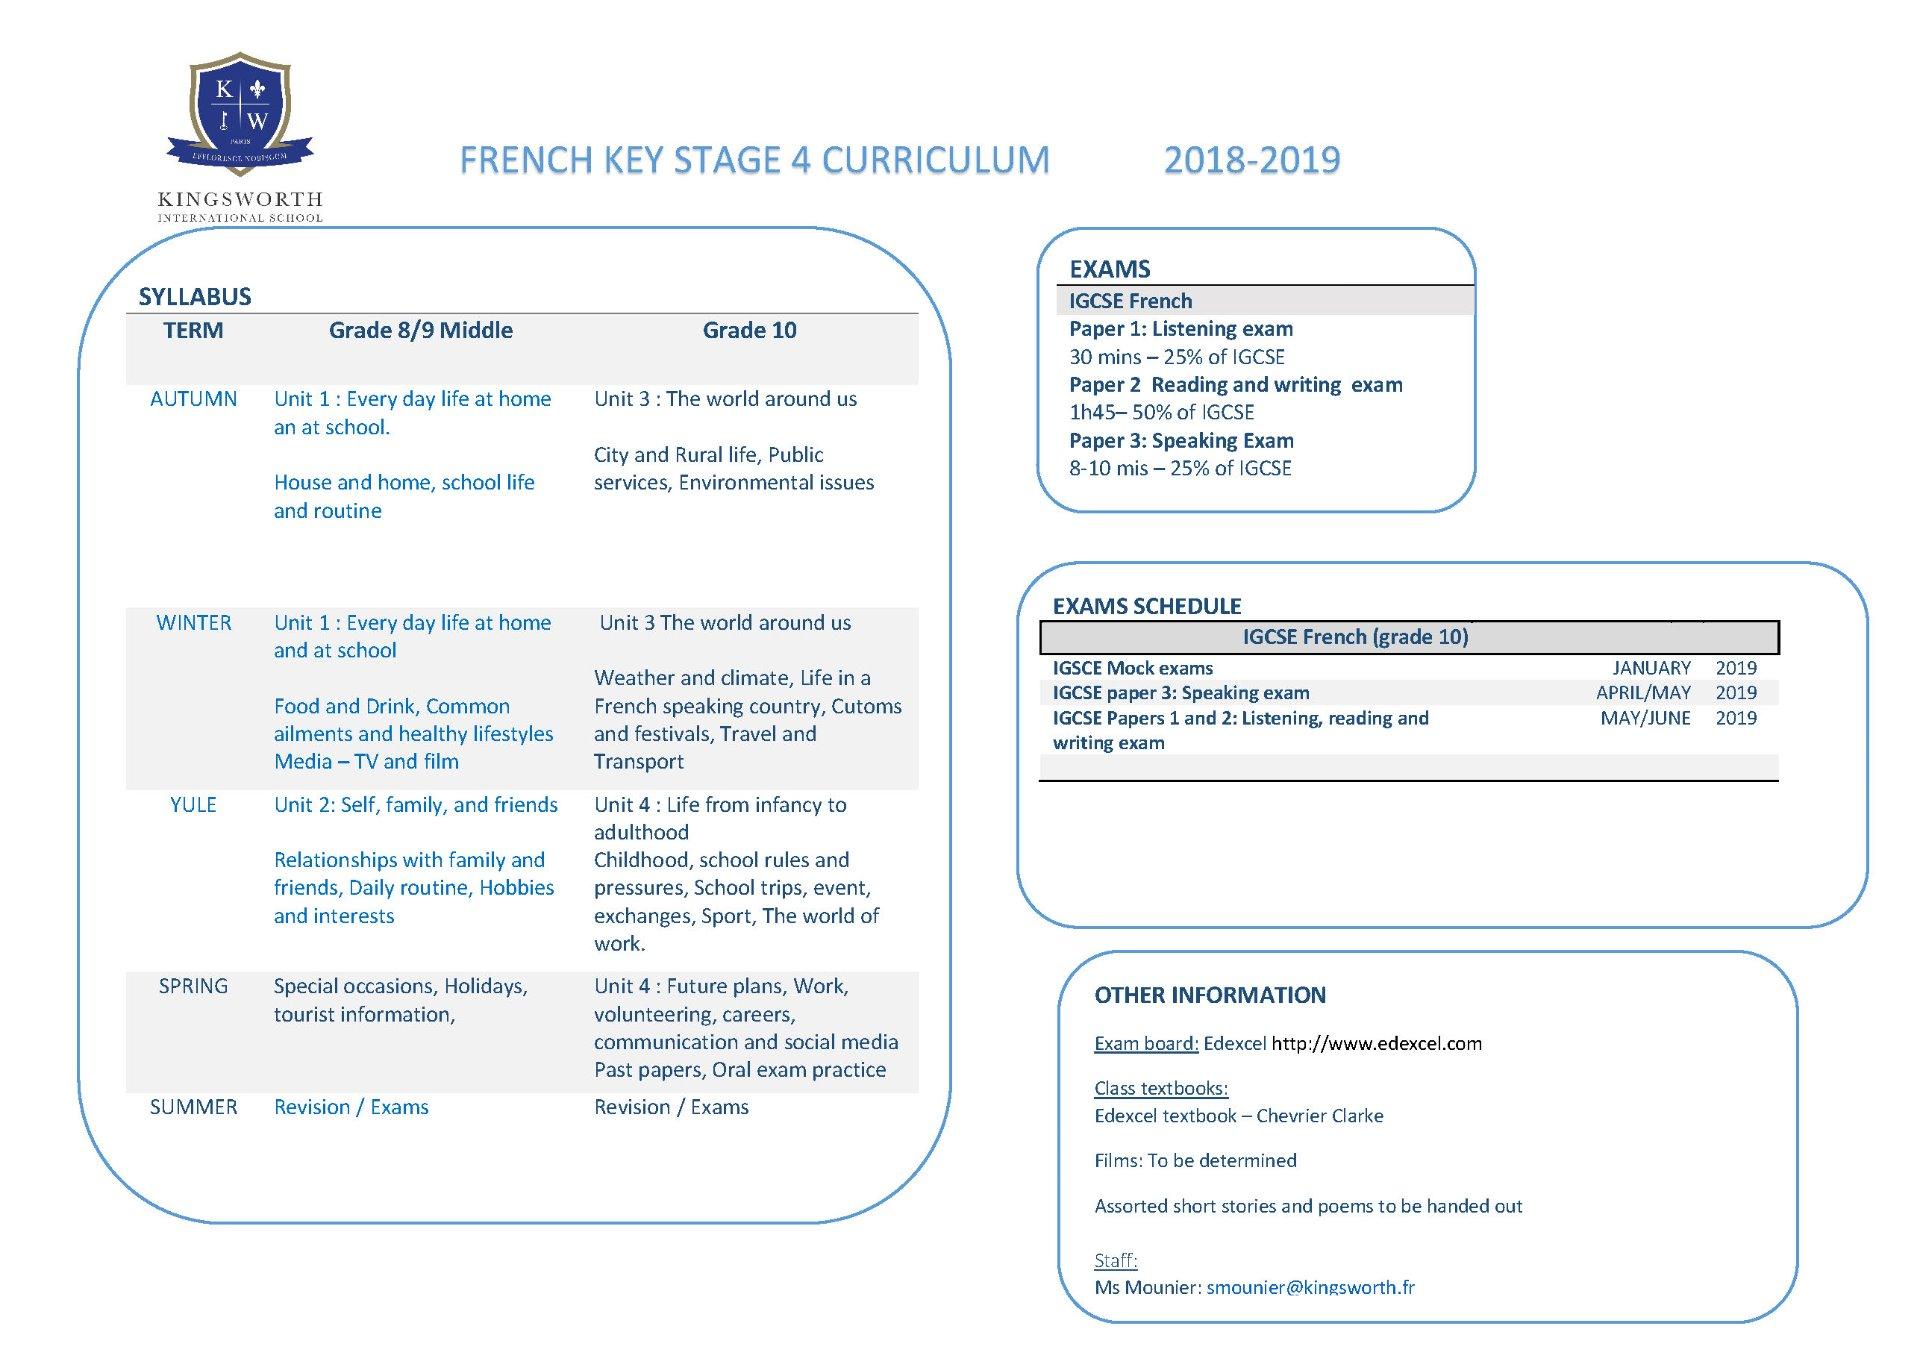 KS4 FRENCH Grade 8/9 Middle and Grade 10 | Kingsworth International